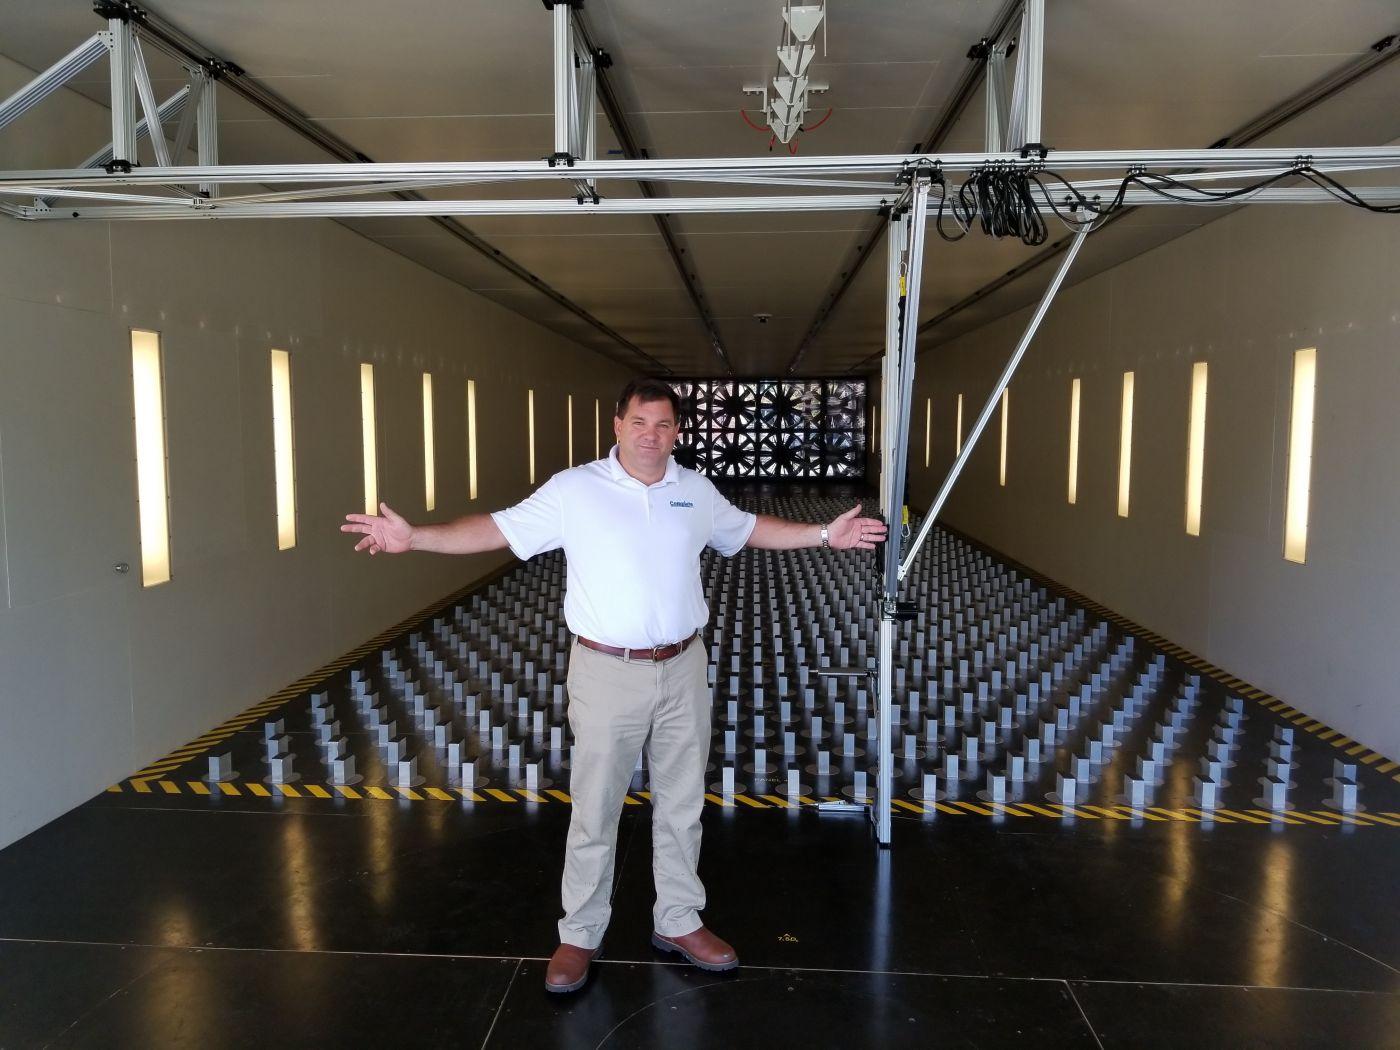 John Minor at UF Powell lab - Fenestration study